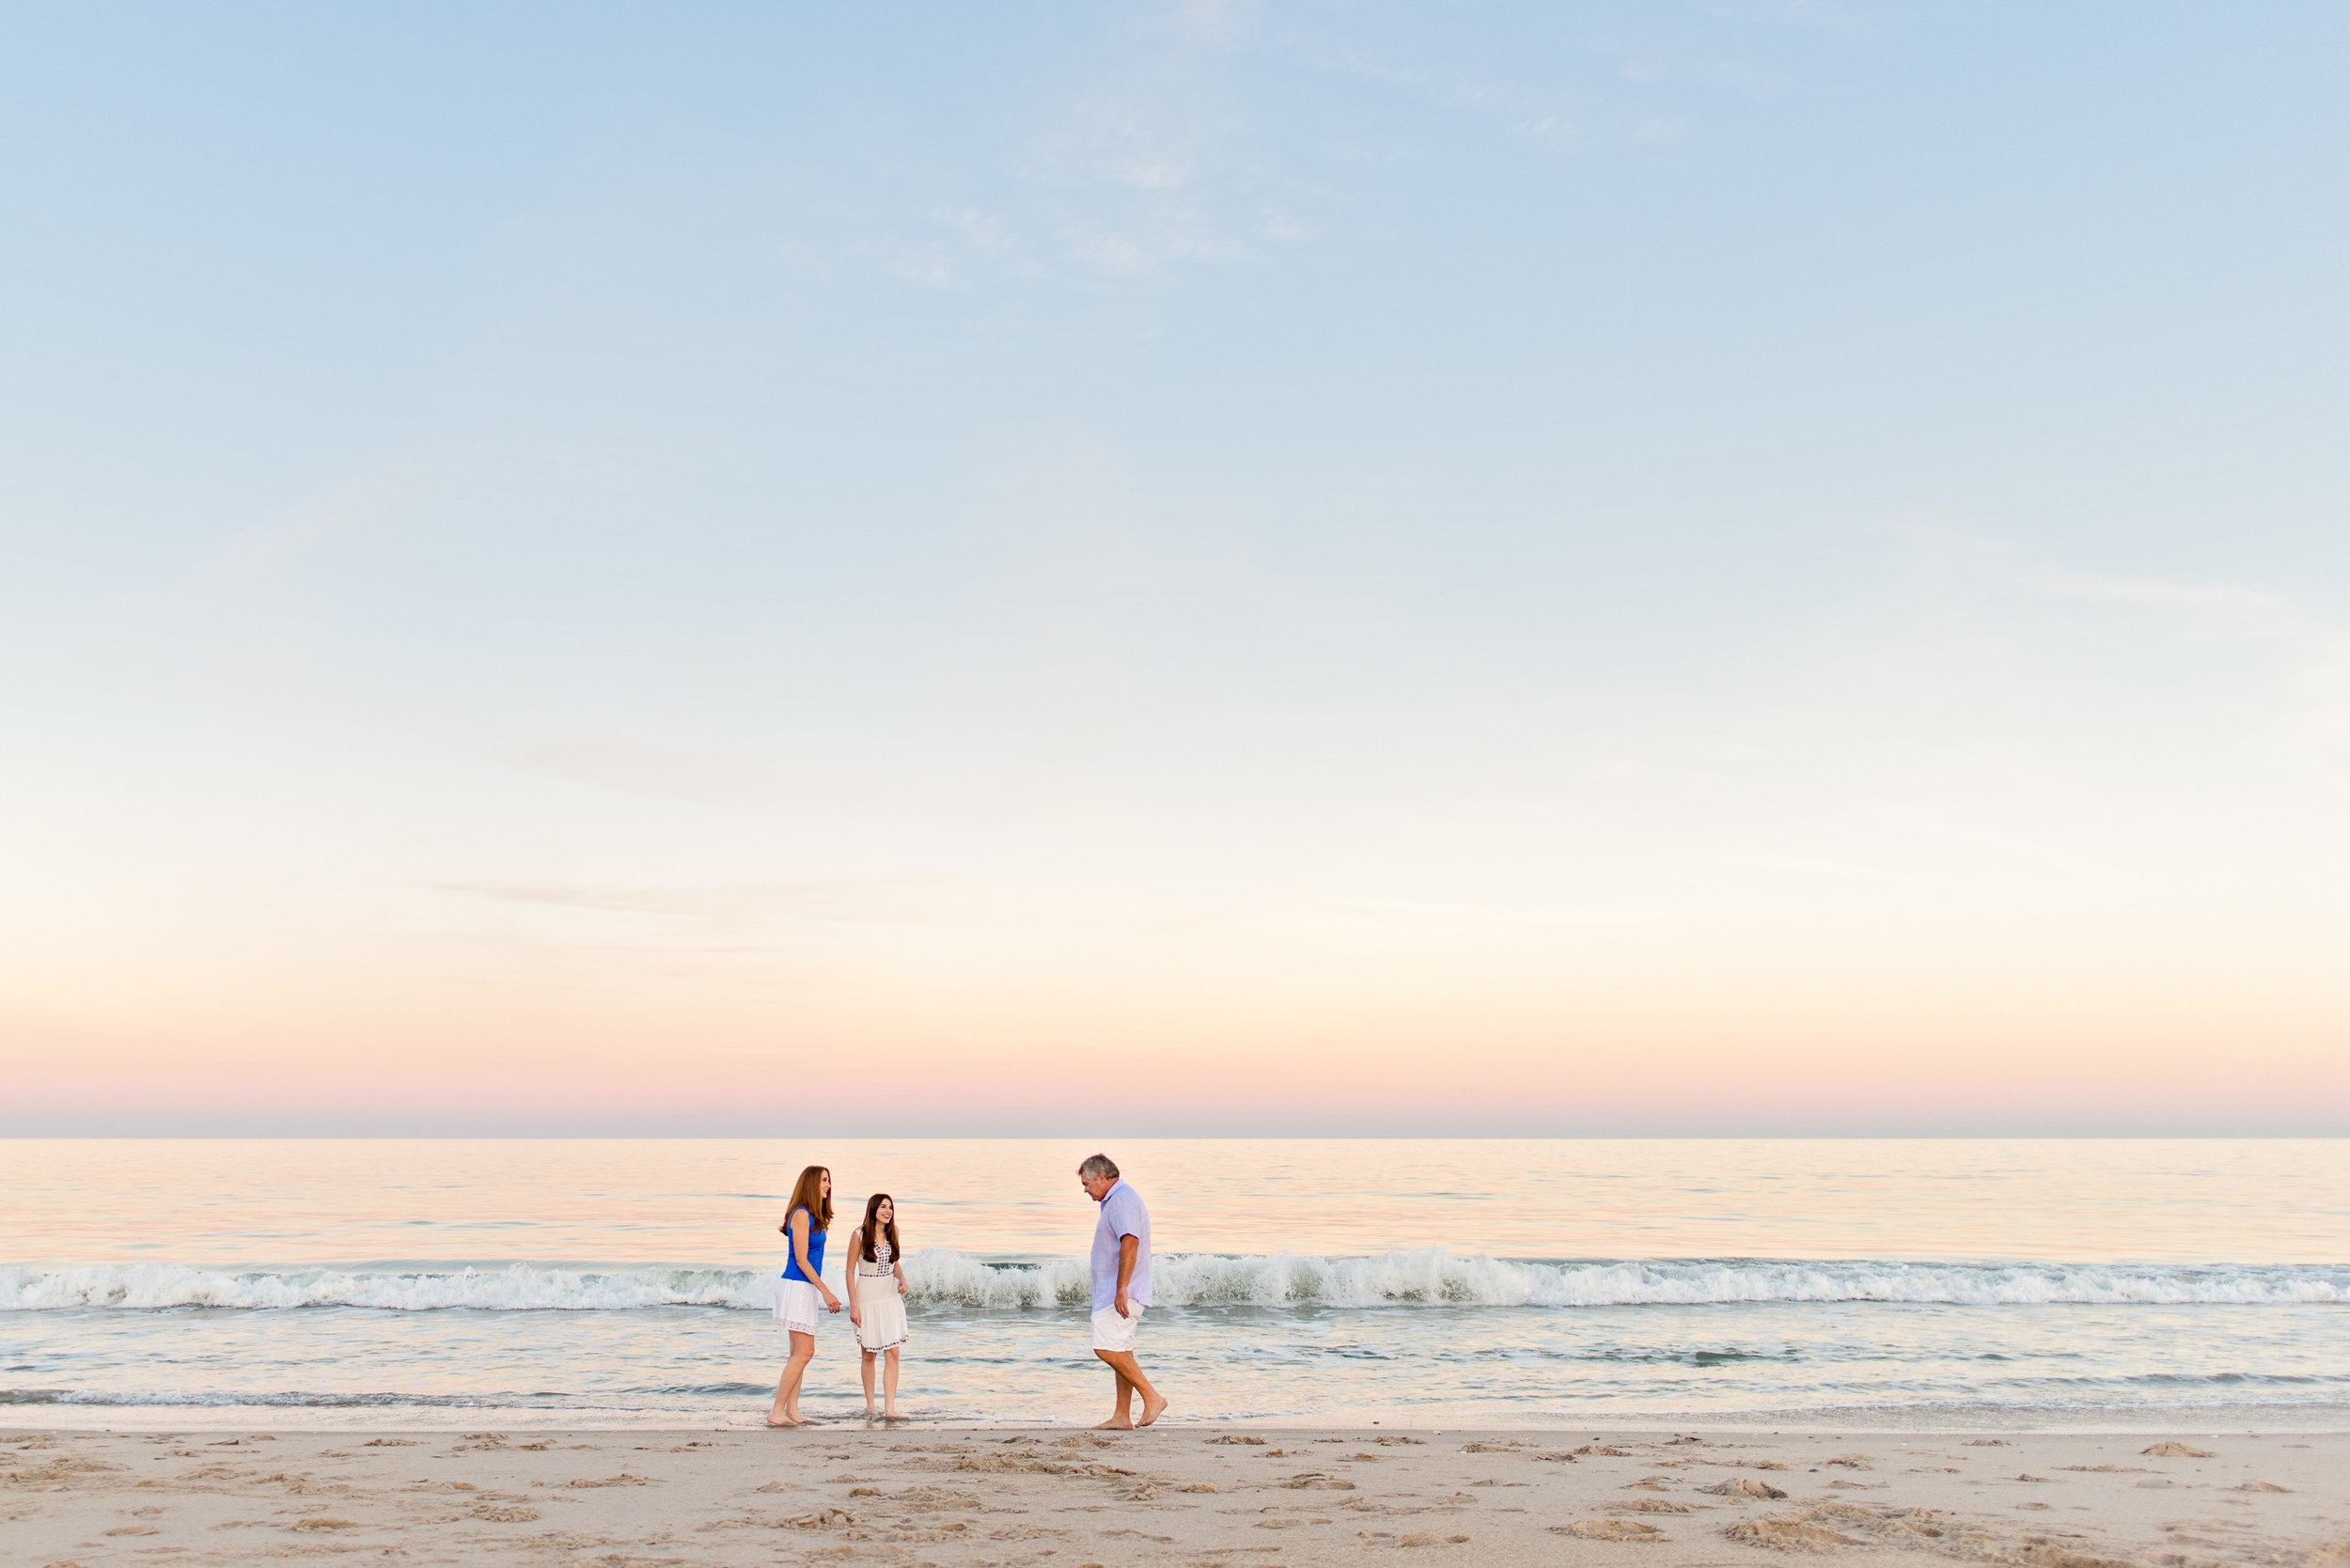 vero-beach-photographer-beach-session-6.jpg